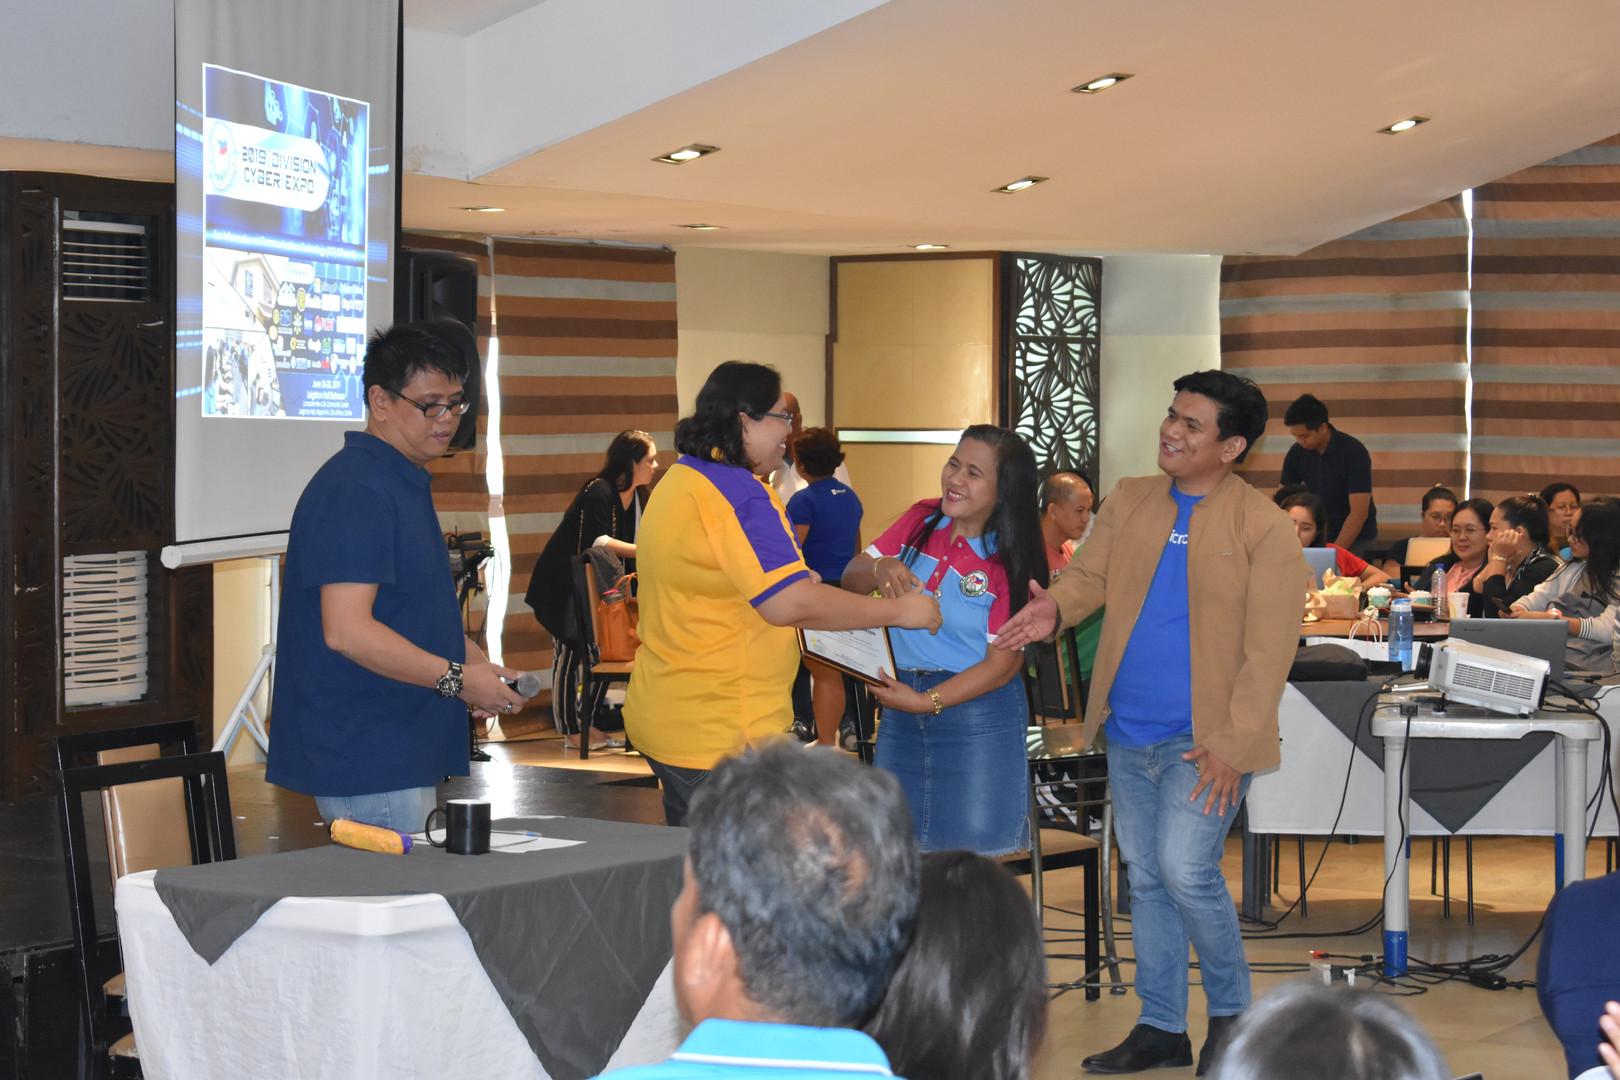 Ms. Marissa Tagado, Business Head of Region IV – A of City Savings Bank and SDO Officials